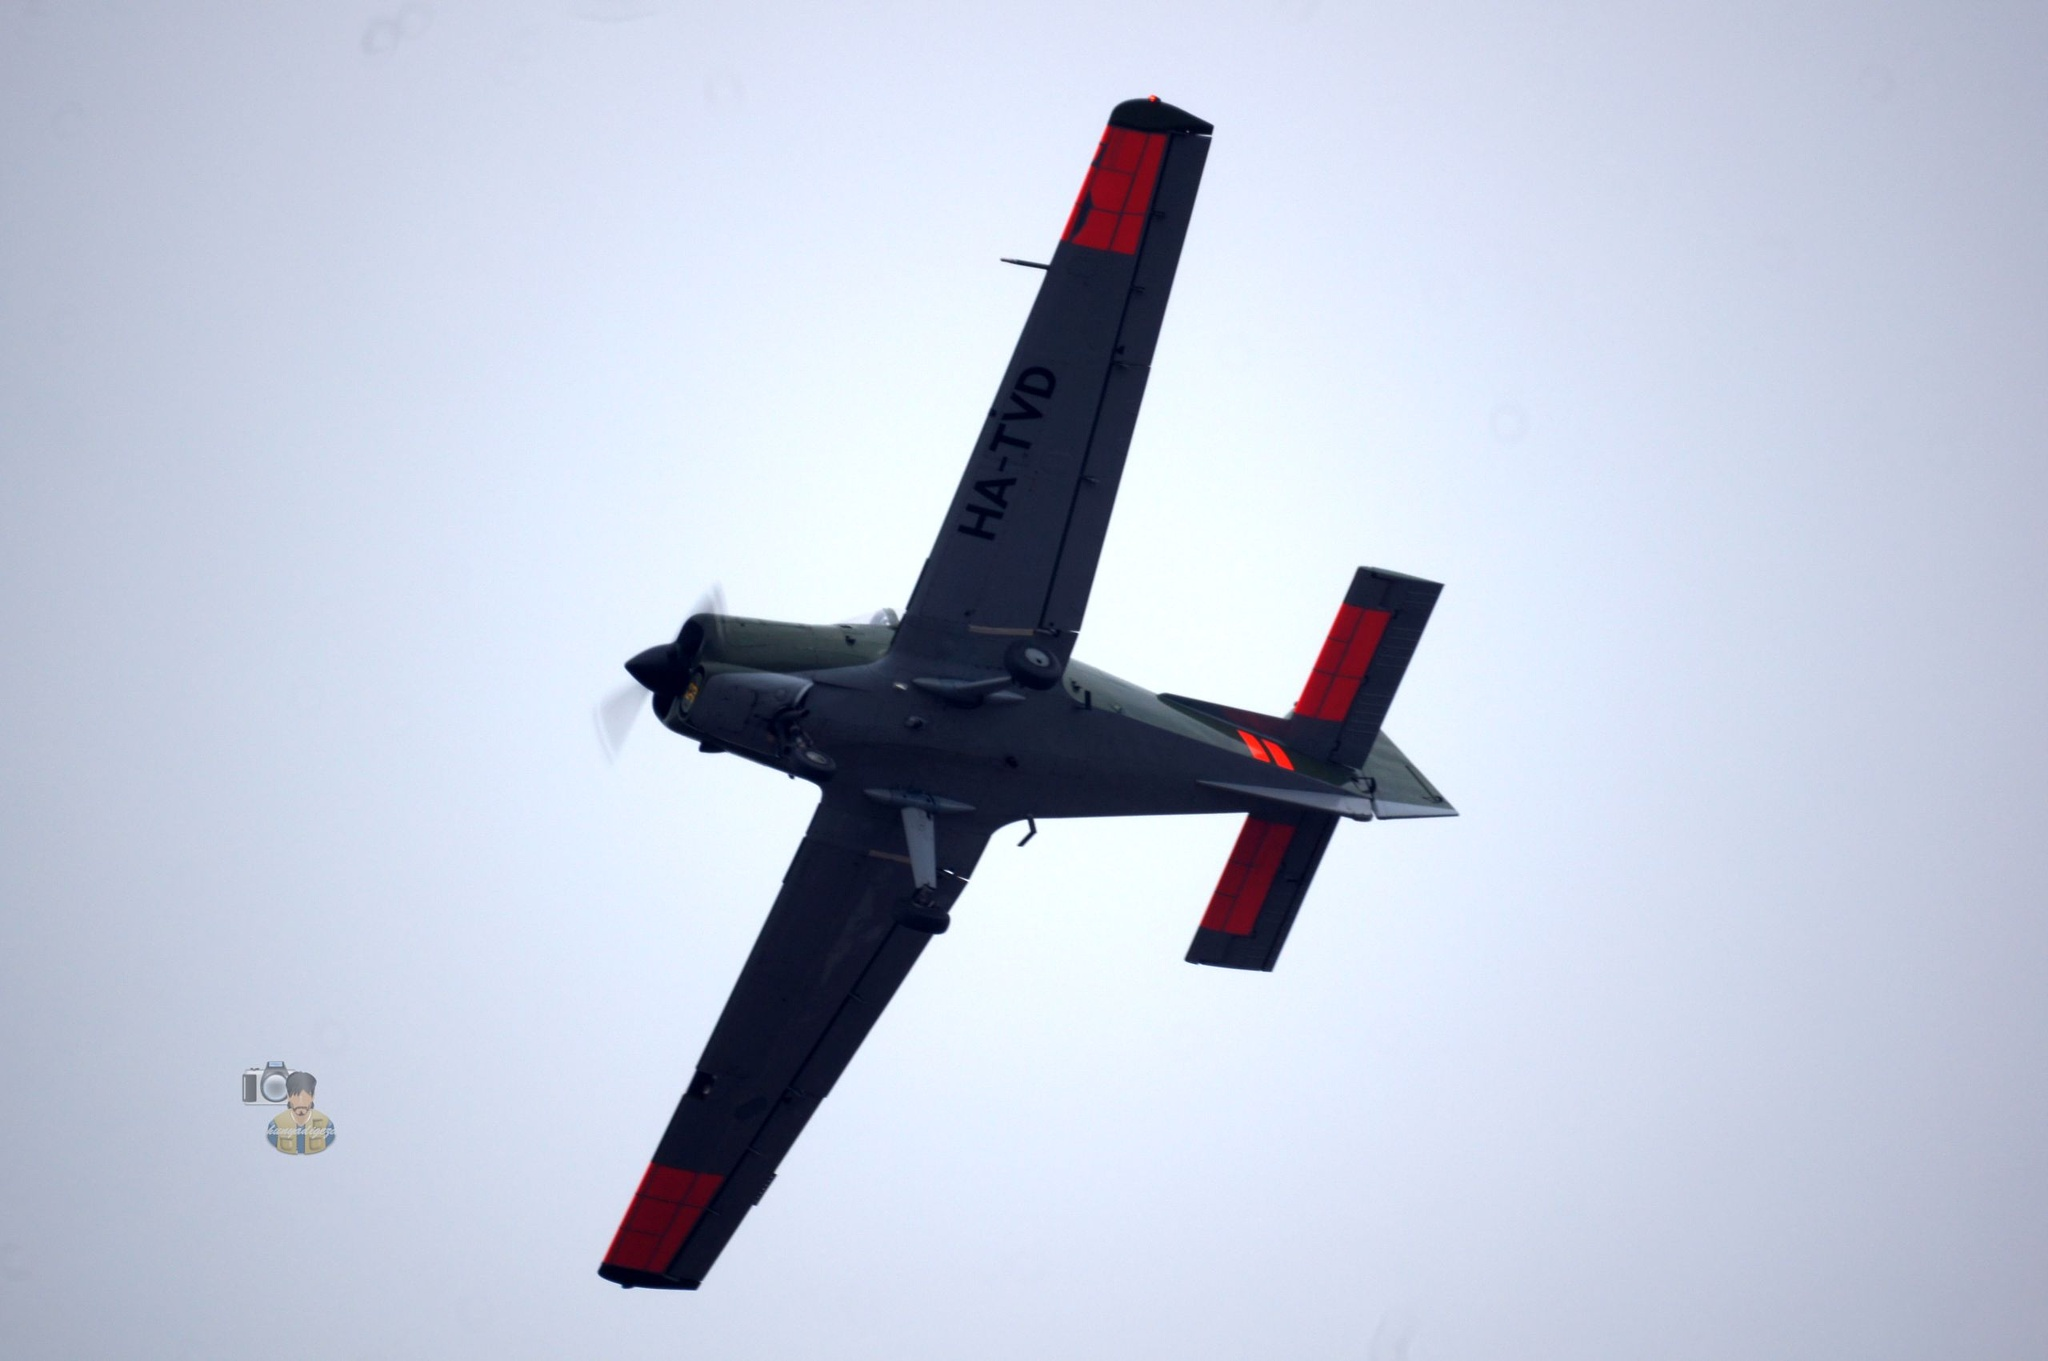 28.02.16. Scottish Aviation Sk 61 Bulldog # HA-TVD  by hunyadigeza